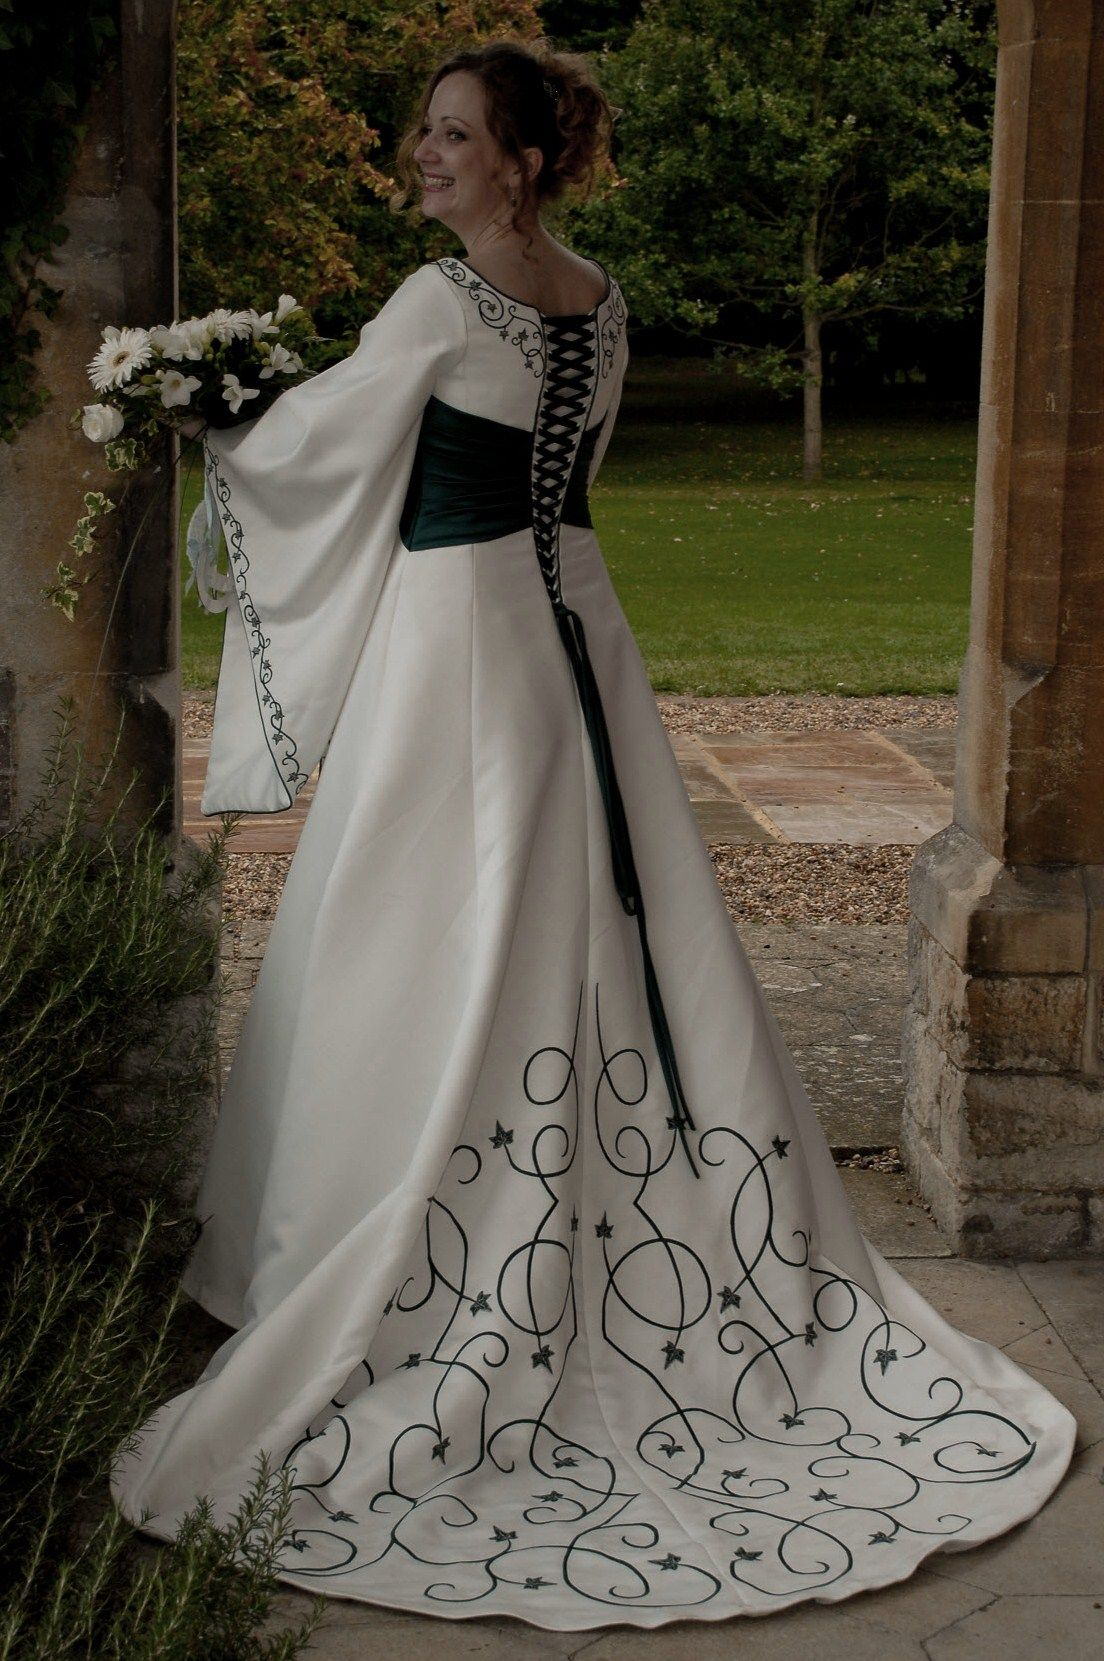 Antique Wedding Wedding Irish Celtic Jewelry History Celtic Wedding Dresses Ireland Celtic Wedding Dresses Sale wedding dress Celtic Wedding Dresses